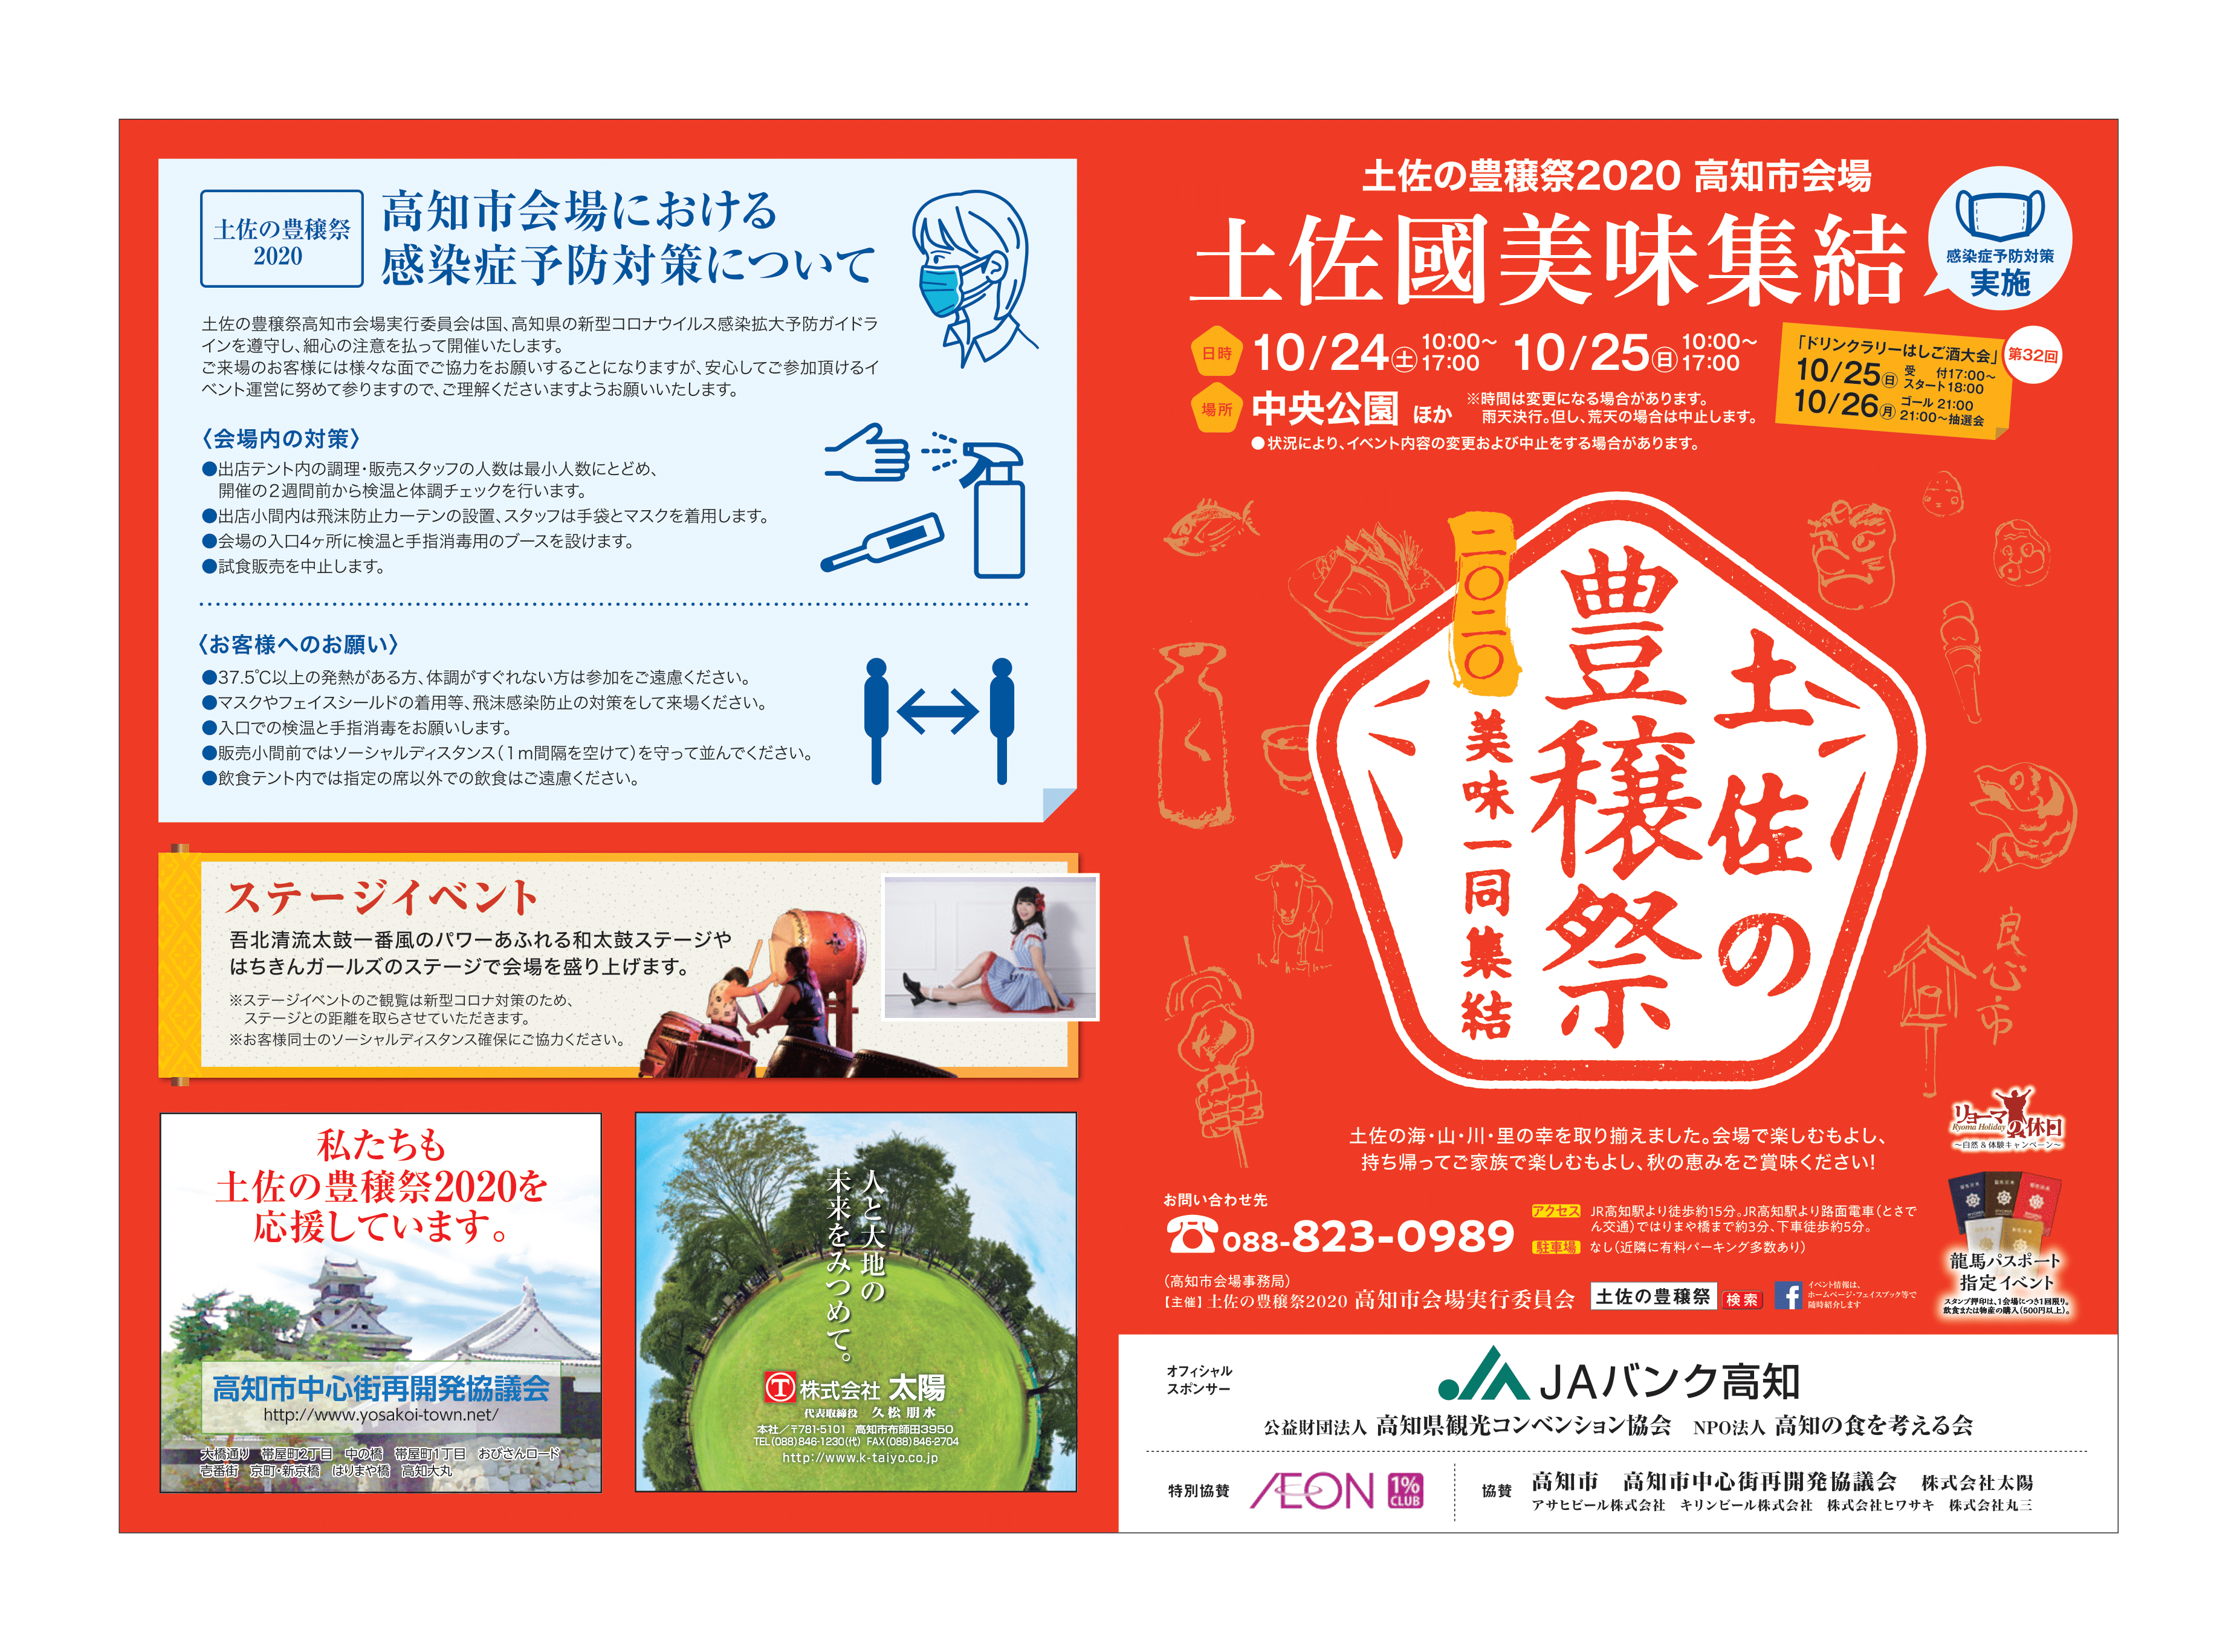 http://47web.jp/kochi/uploads/7628d585a12d6e2487286b140325ee0f52c39bed.png